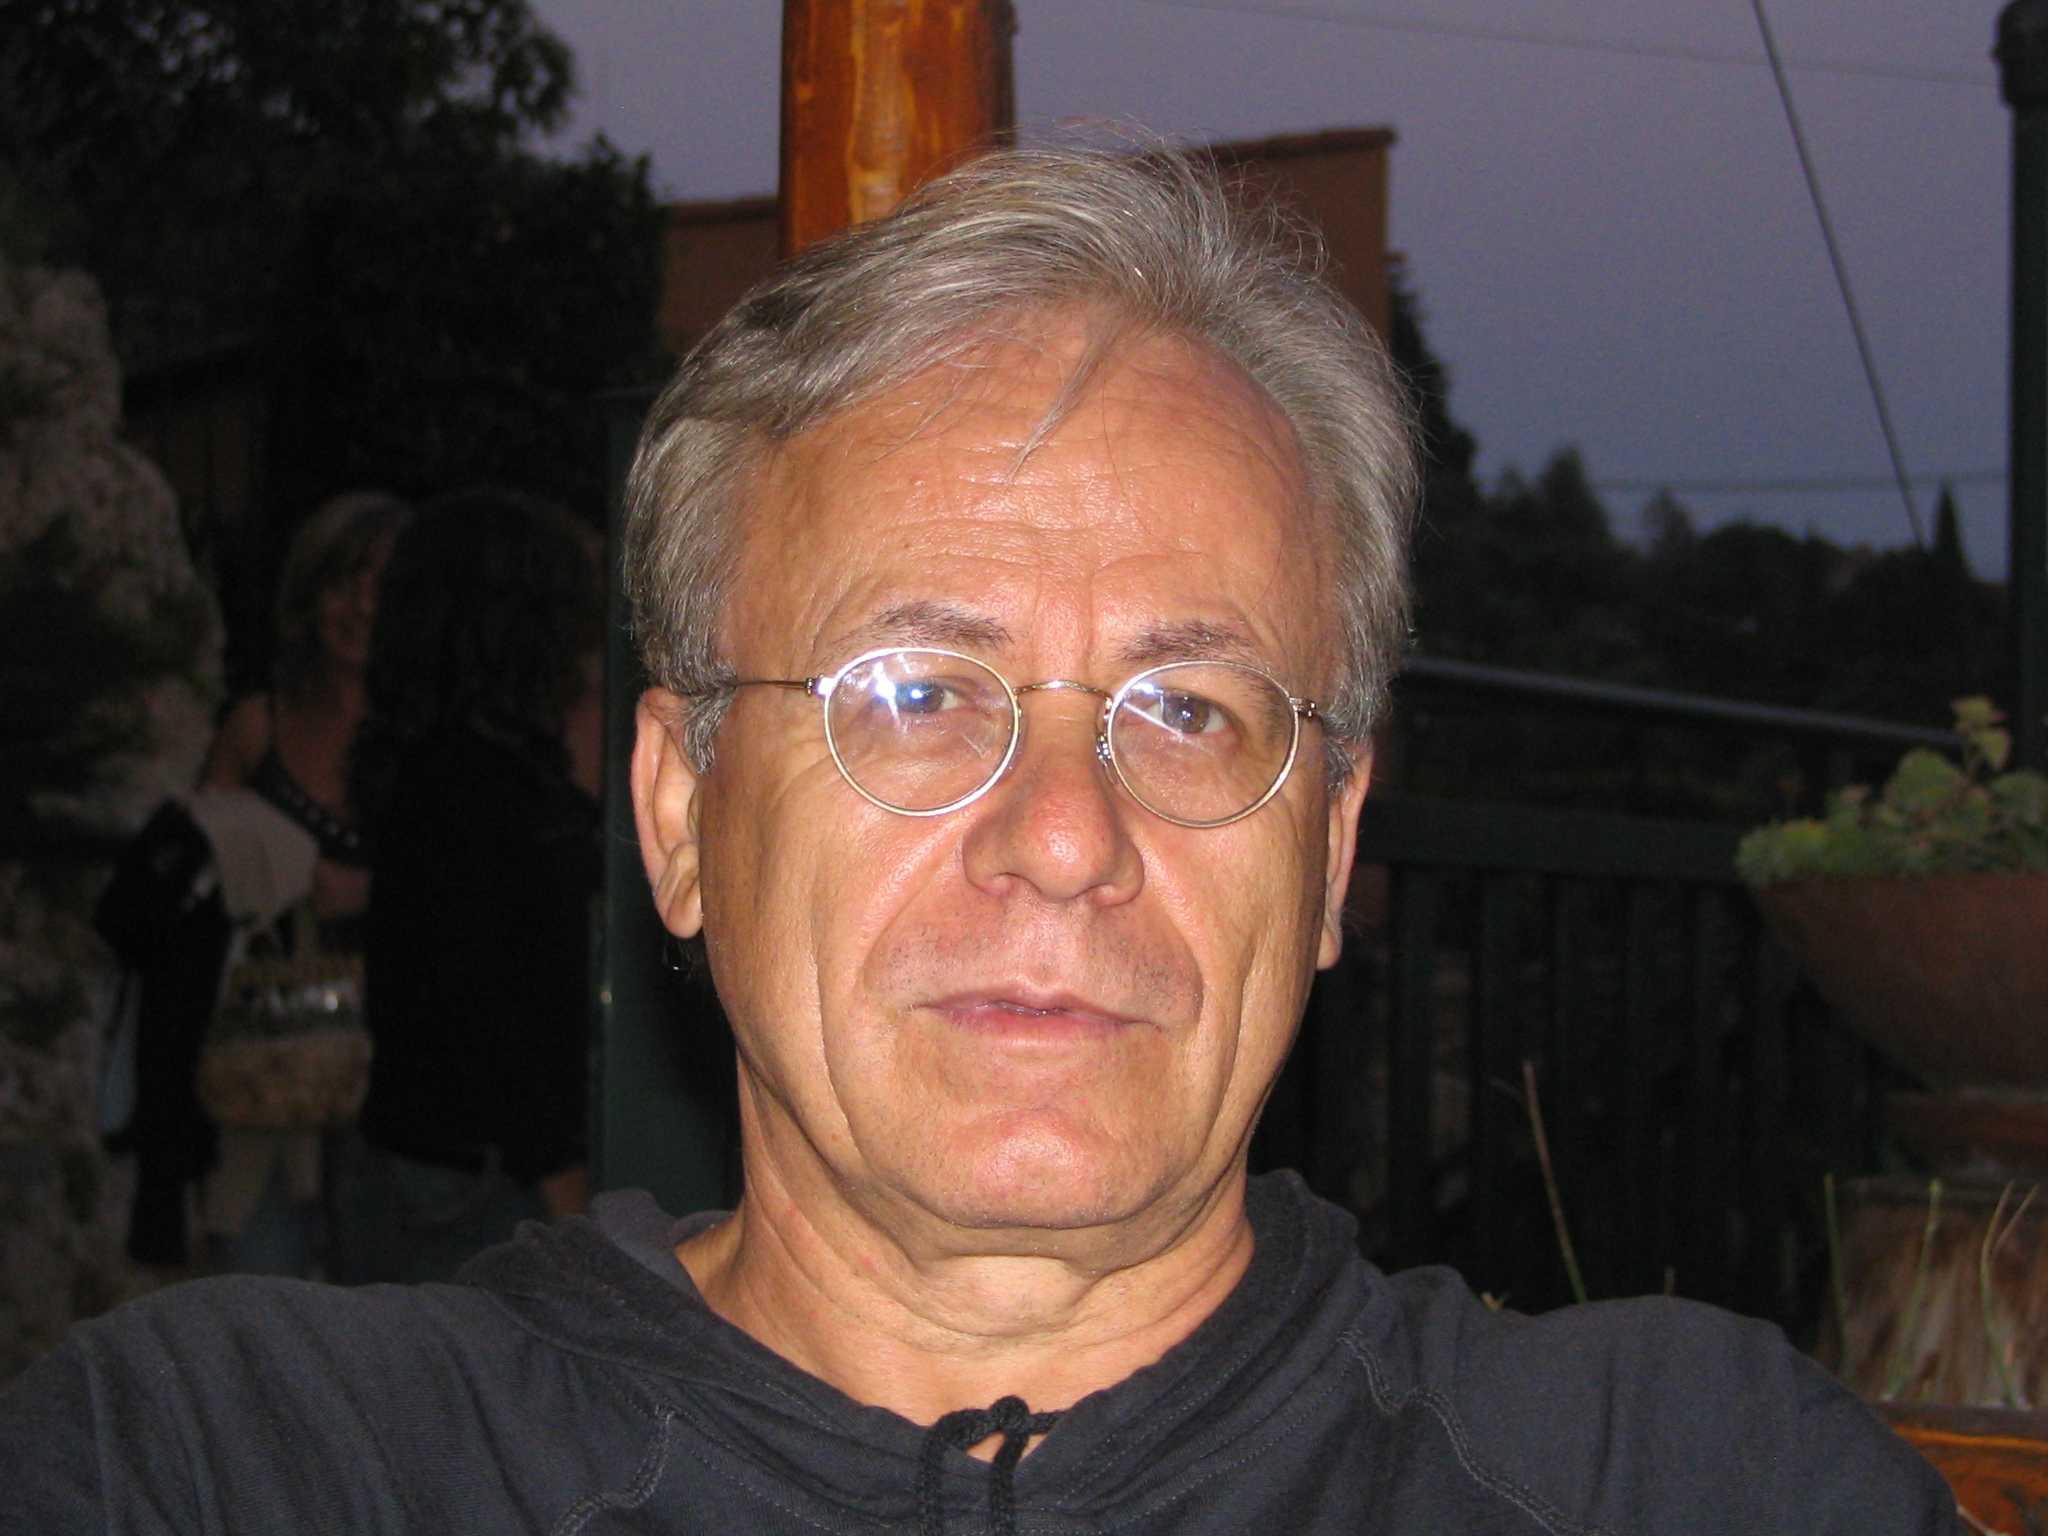 Ioanis Tsiouras